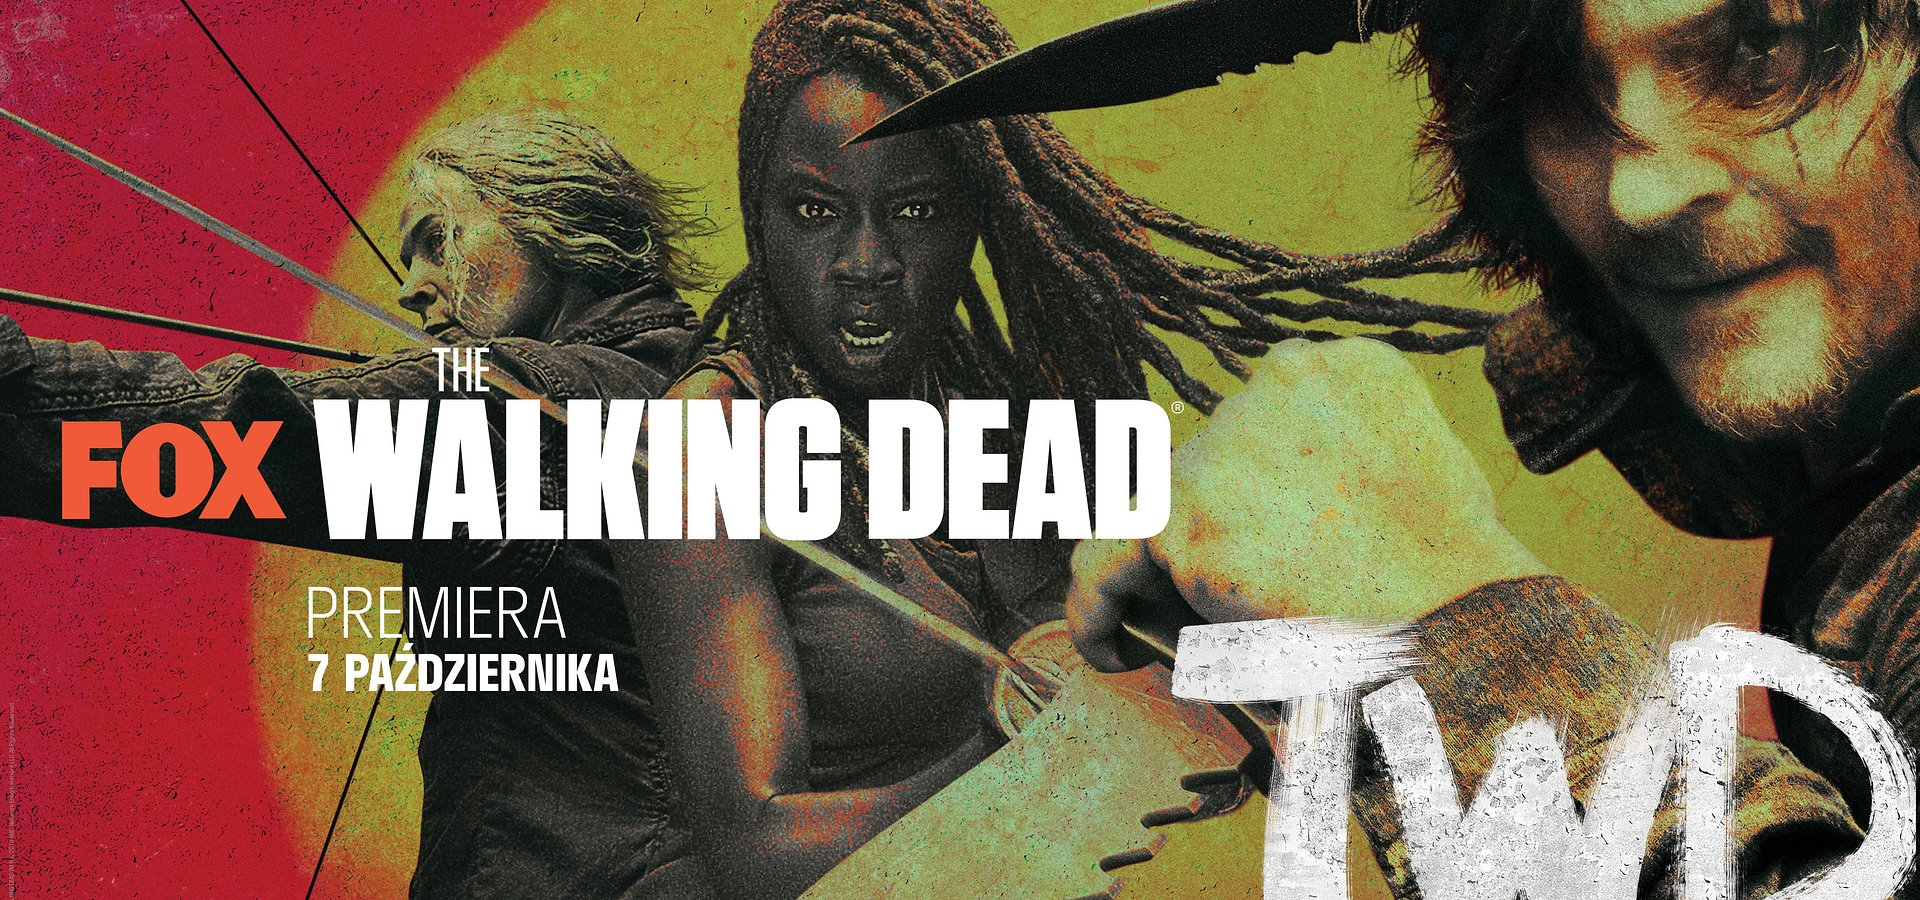 The Walking Dead z nowym zwiastunem